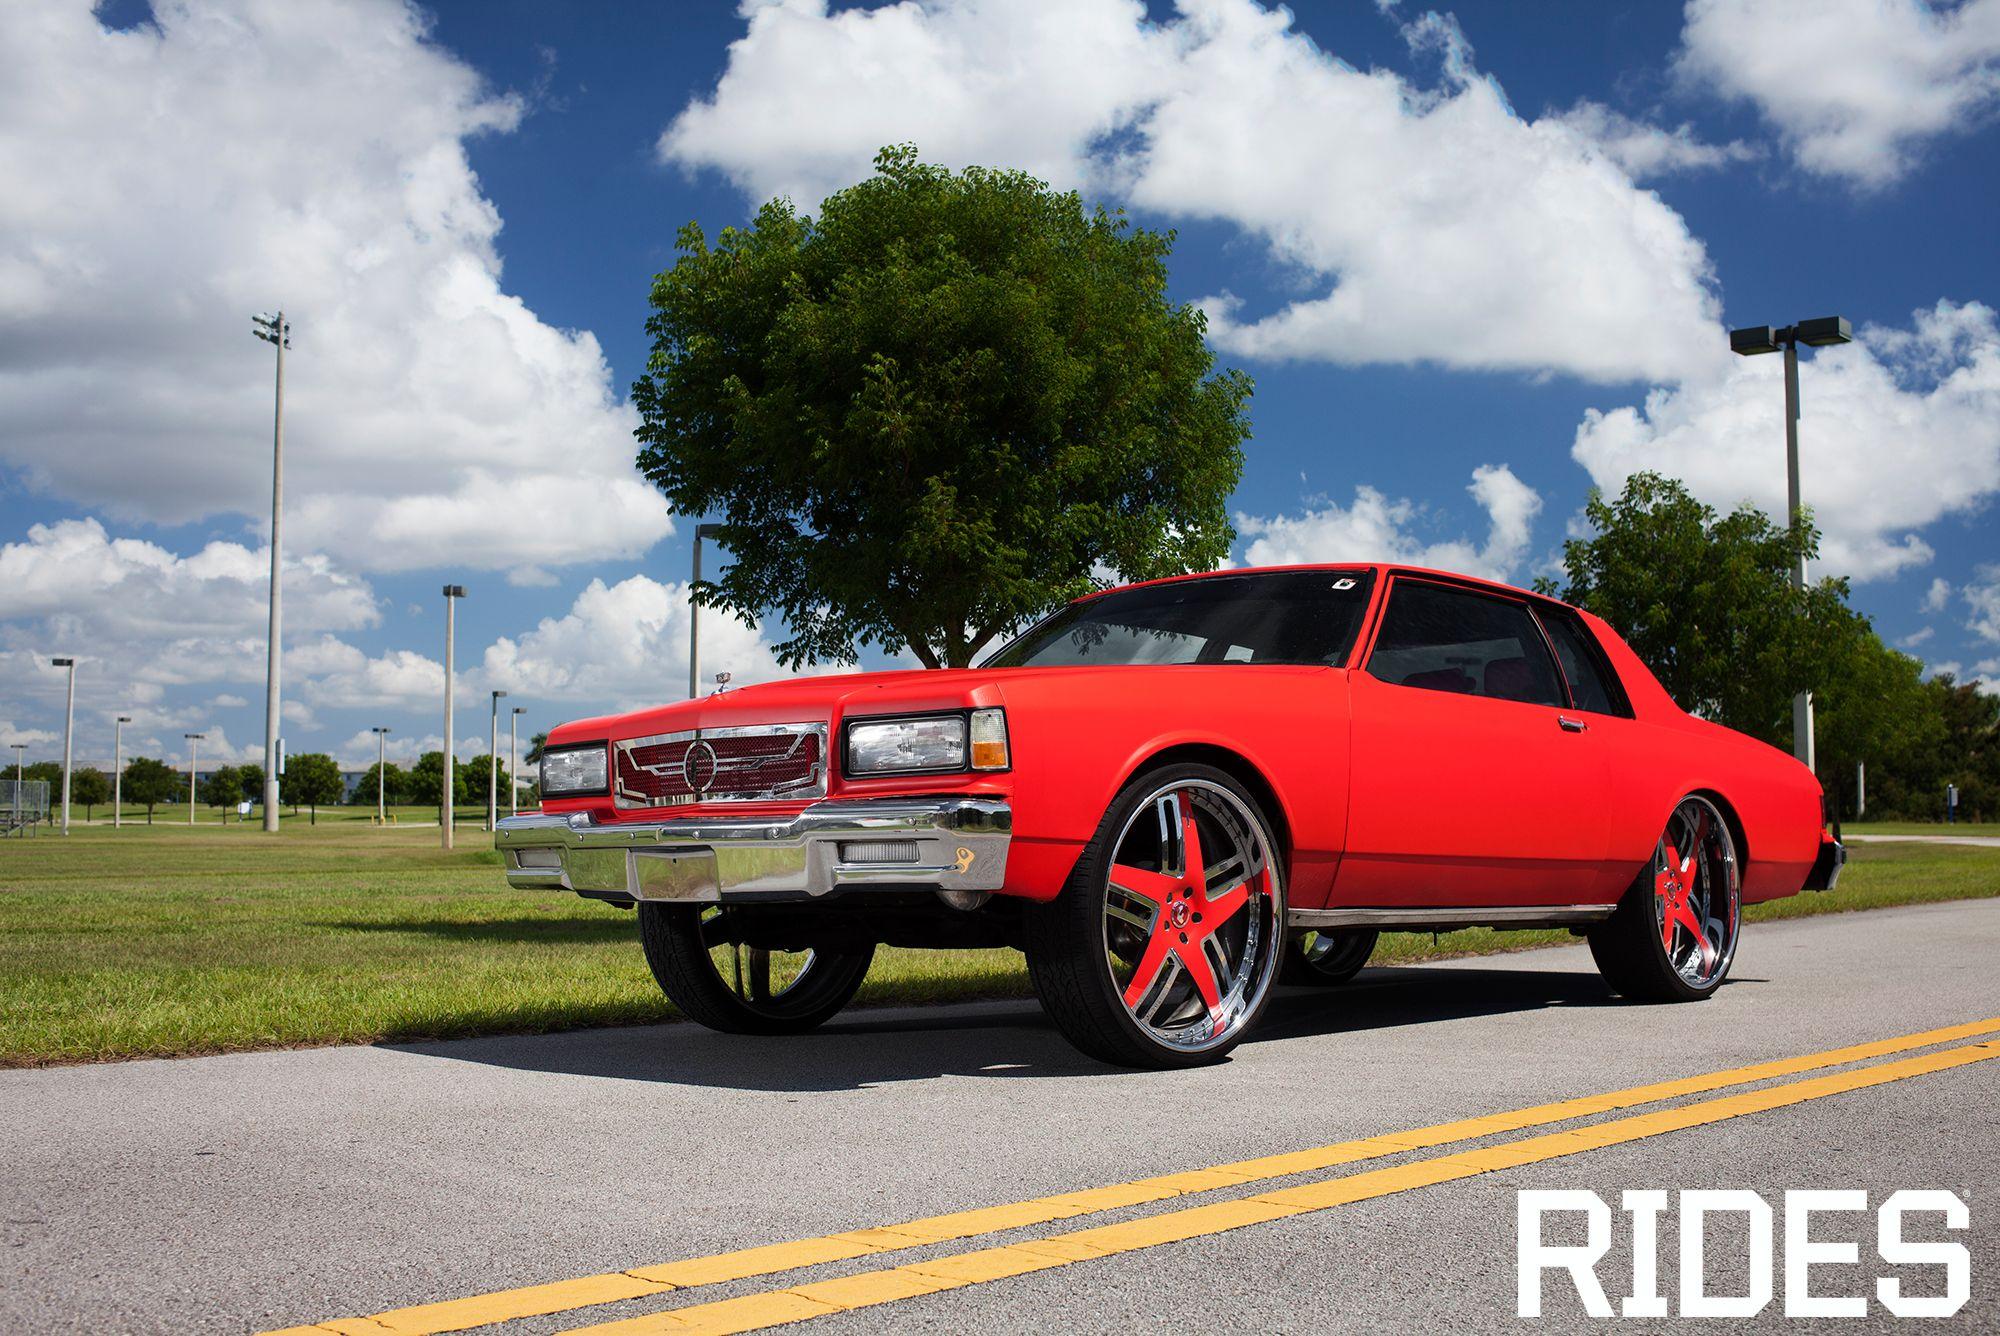 Box Chevy With A Toyota Supra Motor? - Rides Magazine   Cars i <3 ...